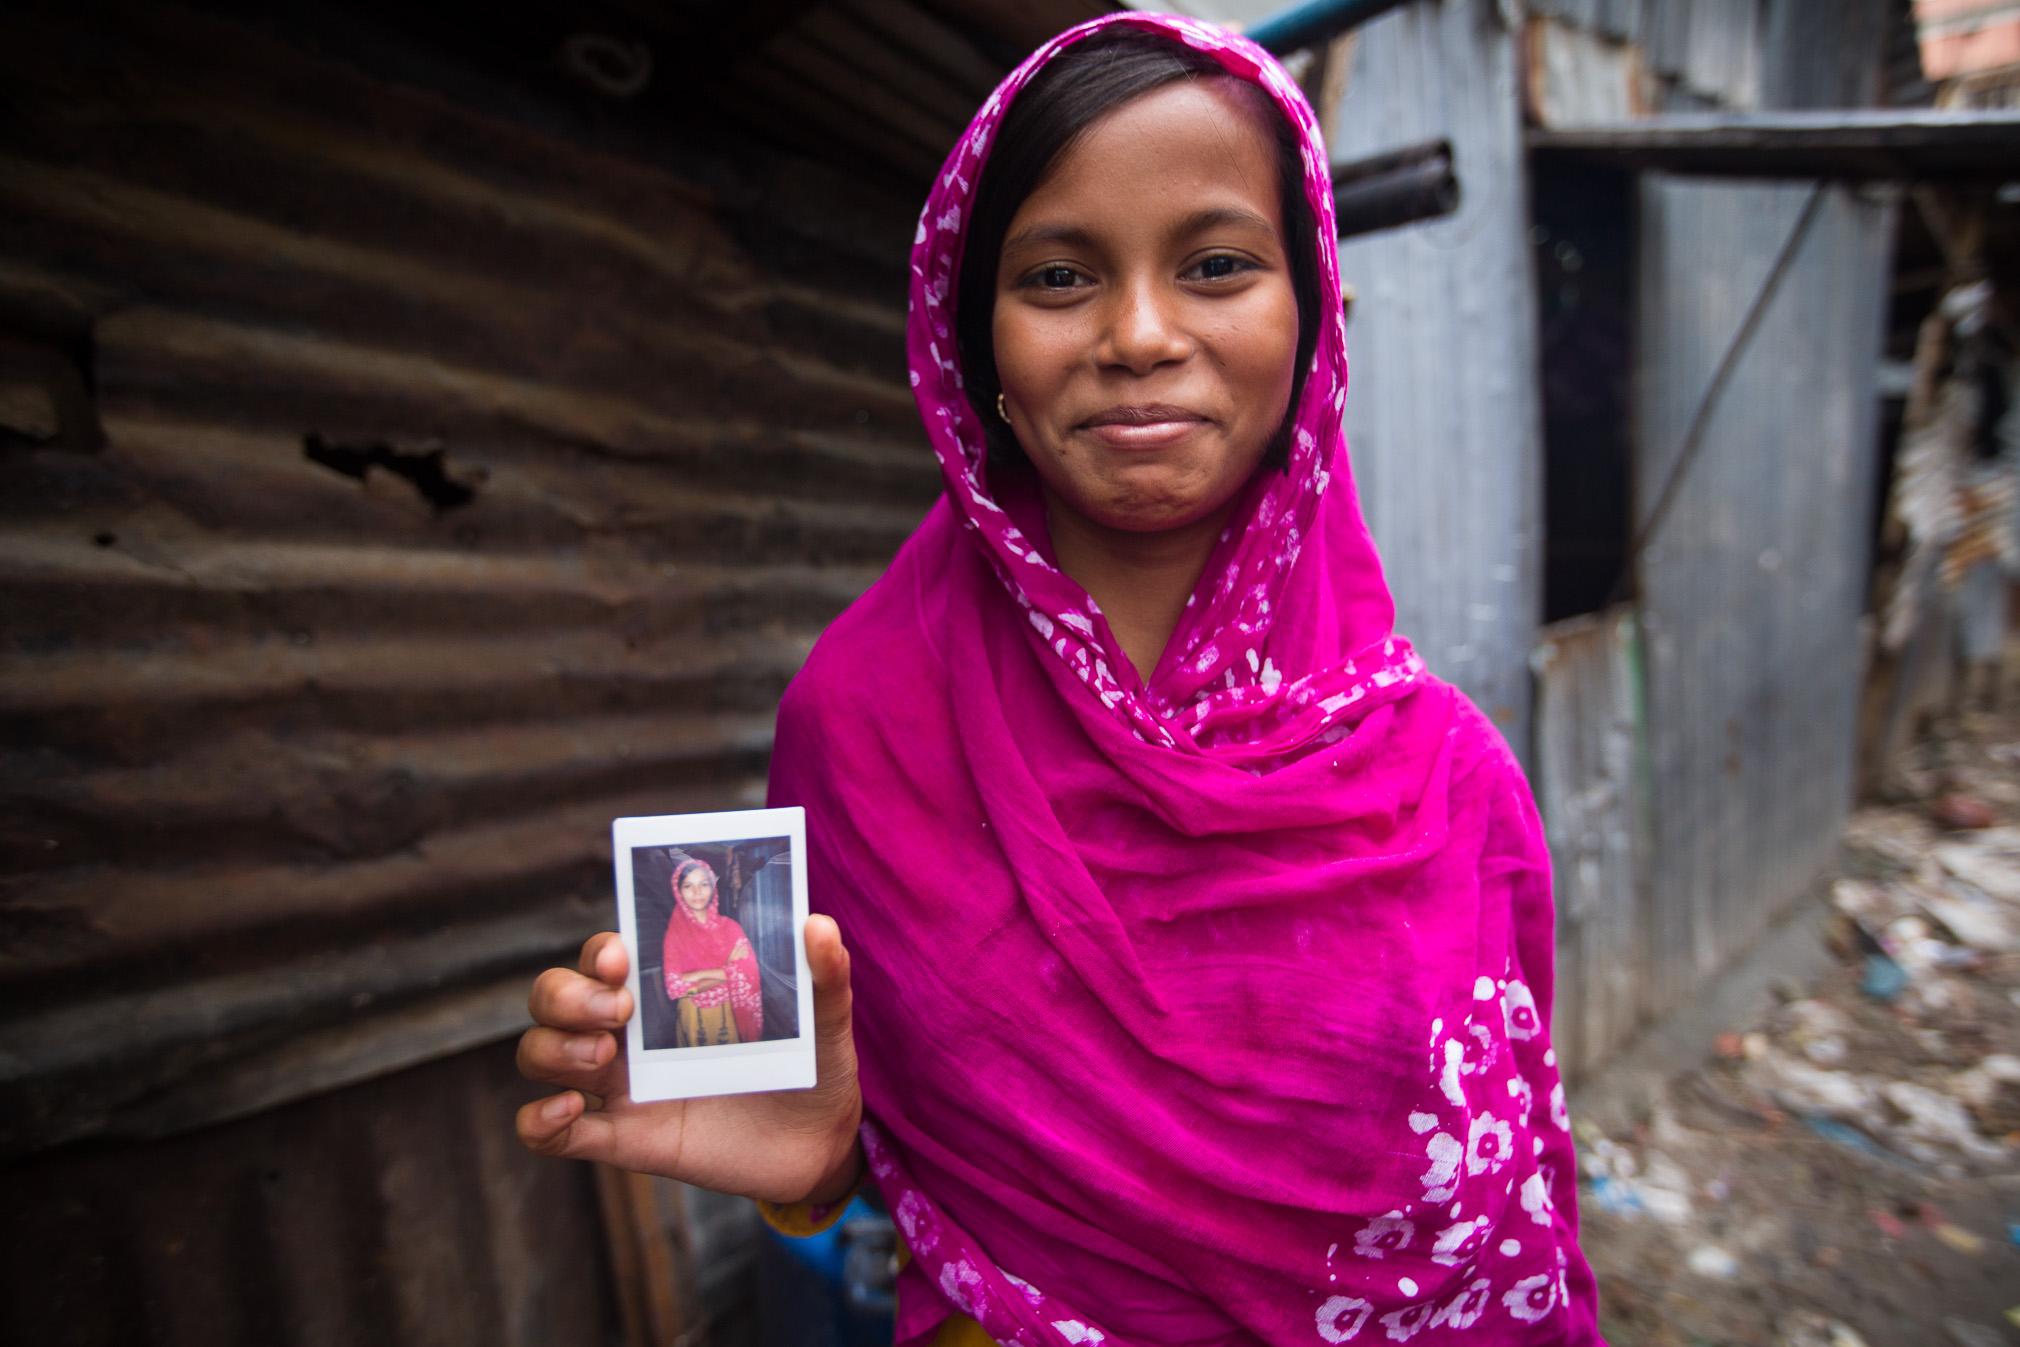 Holding a Fujifilm Instax print, Dhaka, Bangladesh